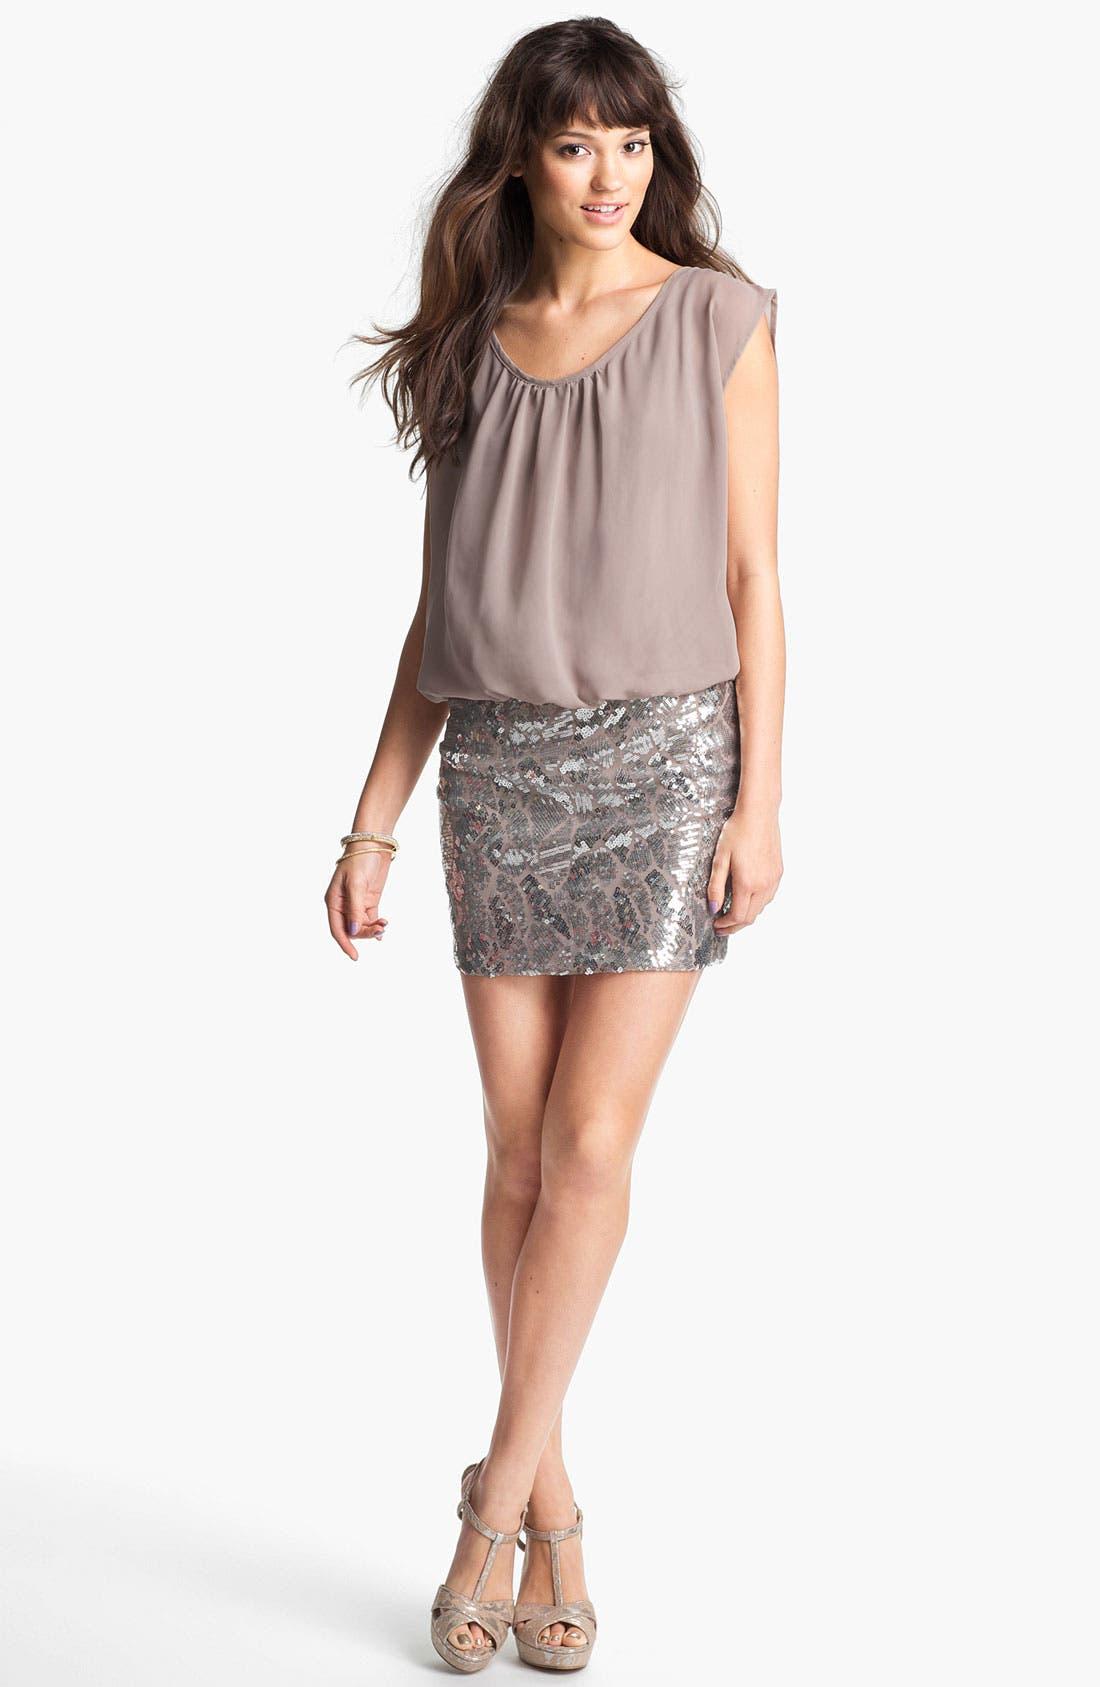 Alternate Image 1 Selected - As U Wish Sequin Skirt Blouson Dress (Juniors)